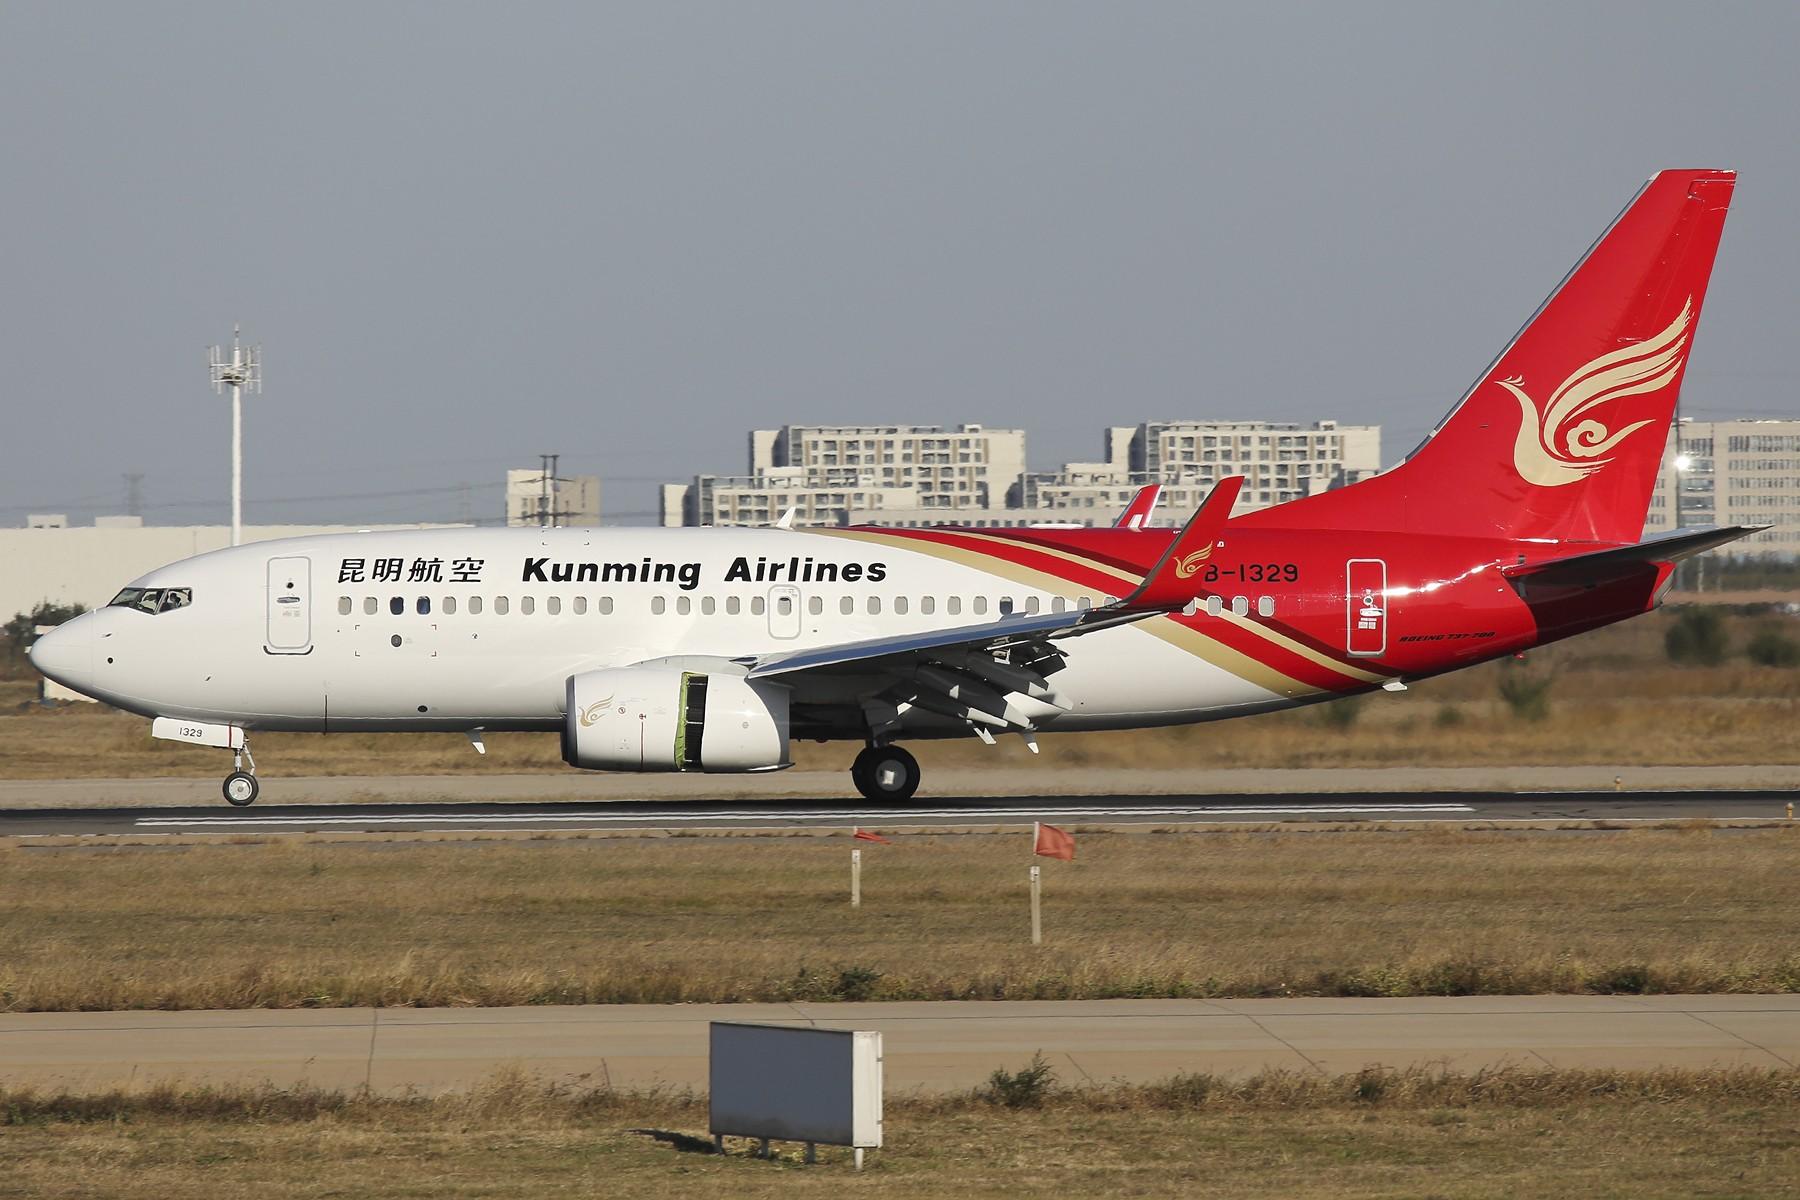 Re:[原创]【TSN飞友会】 November 深秋~ BOEING 737-700 B-1329 中国天津滨海国际机场